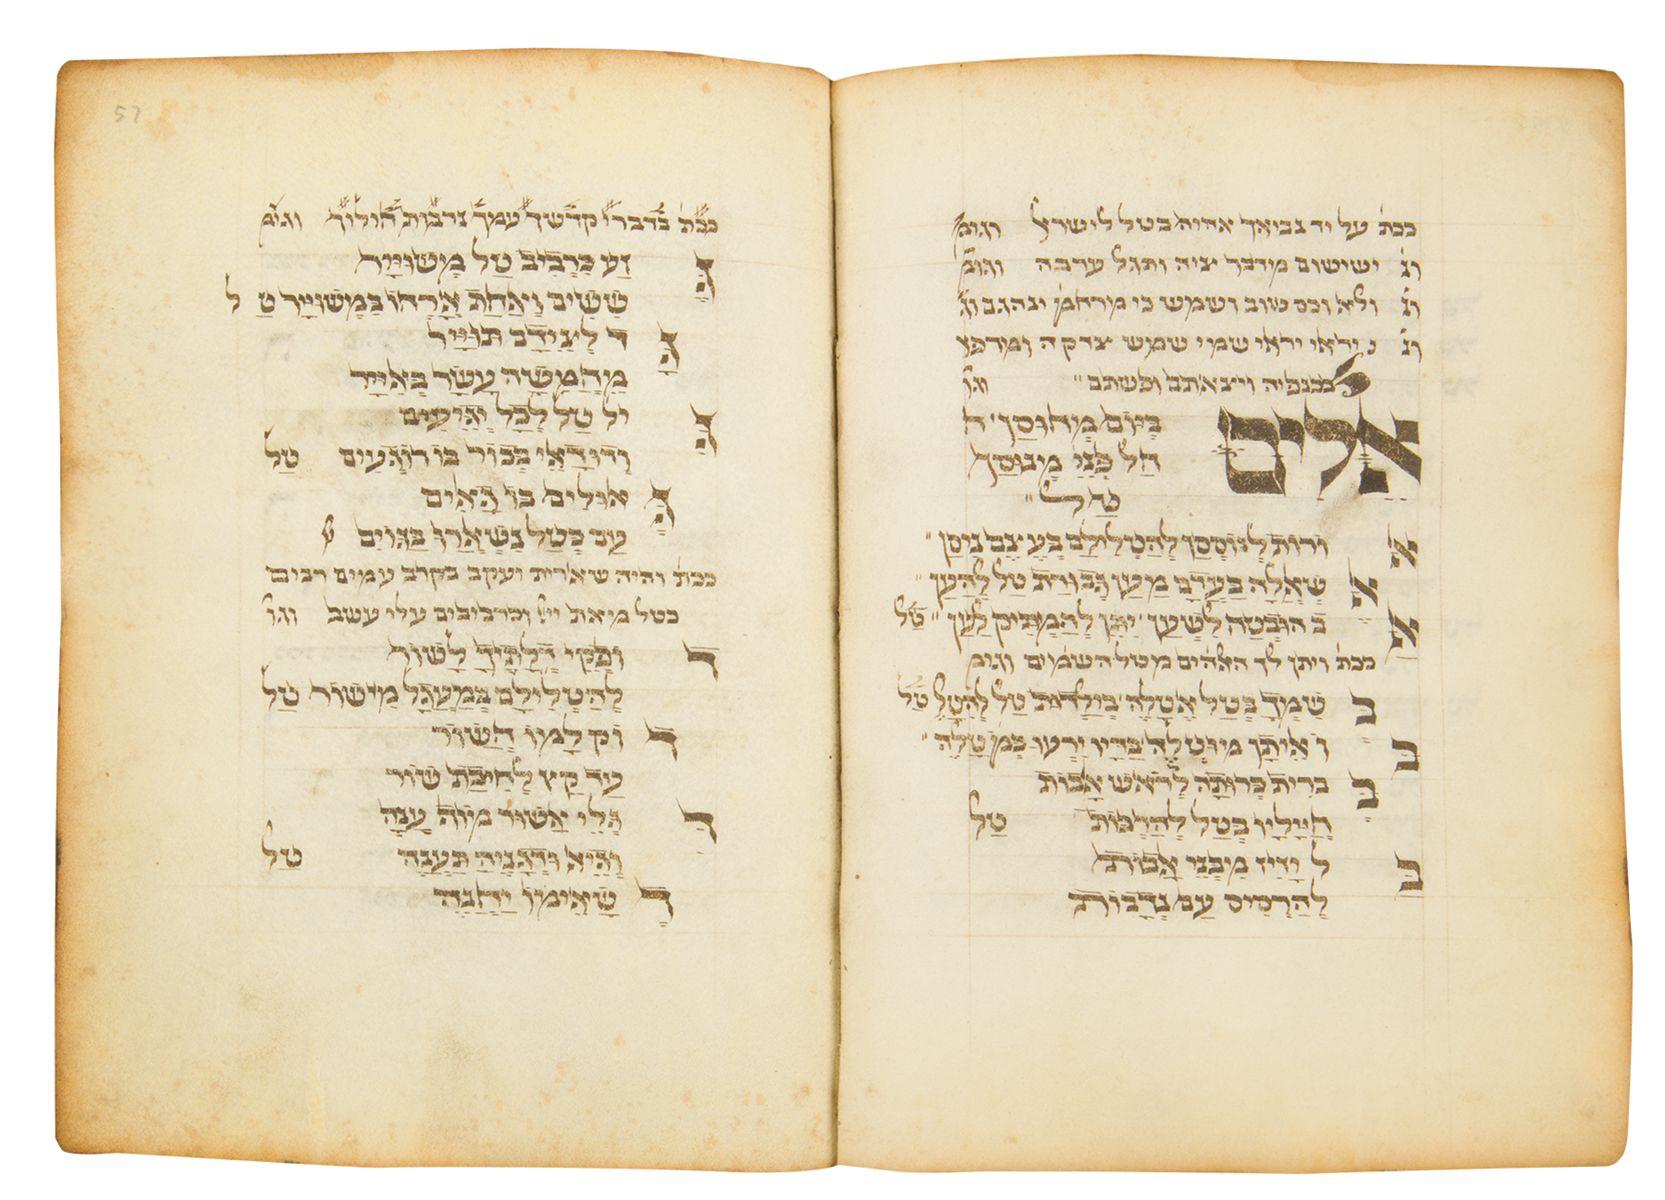 Machzor LePesach Minhag Aschkenaz [prayer-book for Passover]. Rite according to Aschkenazi custom.